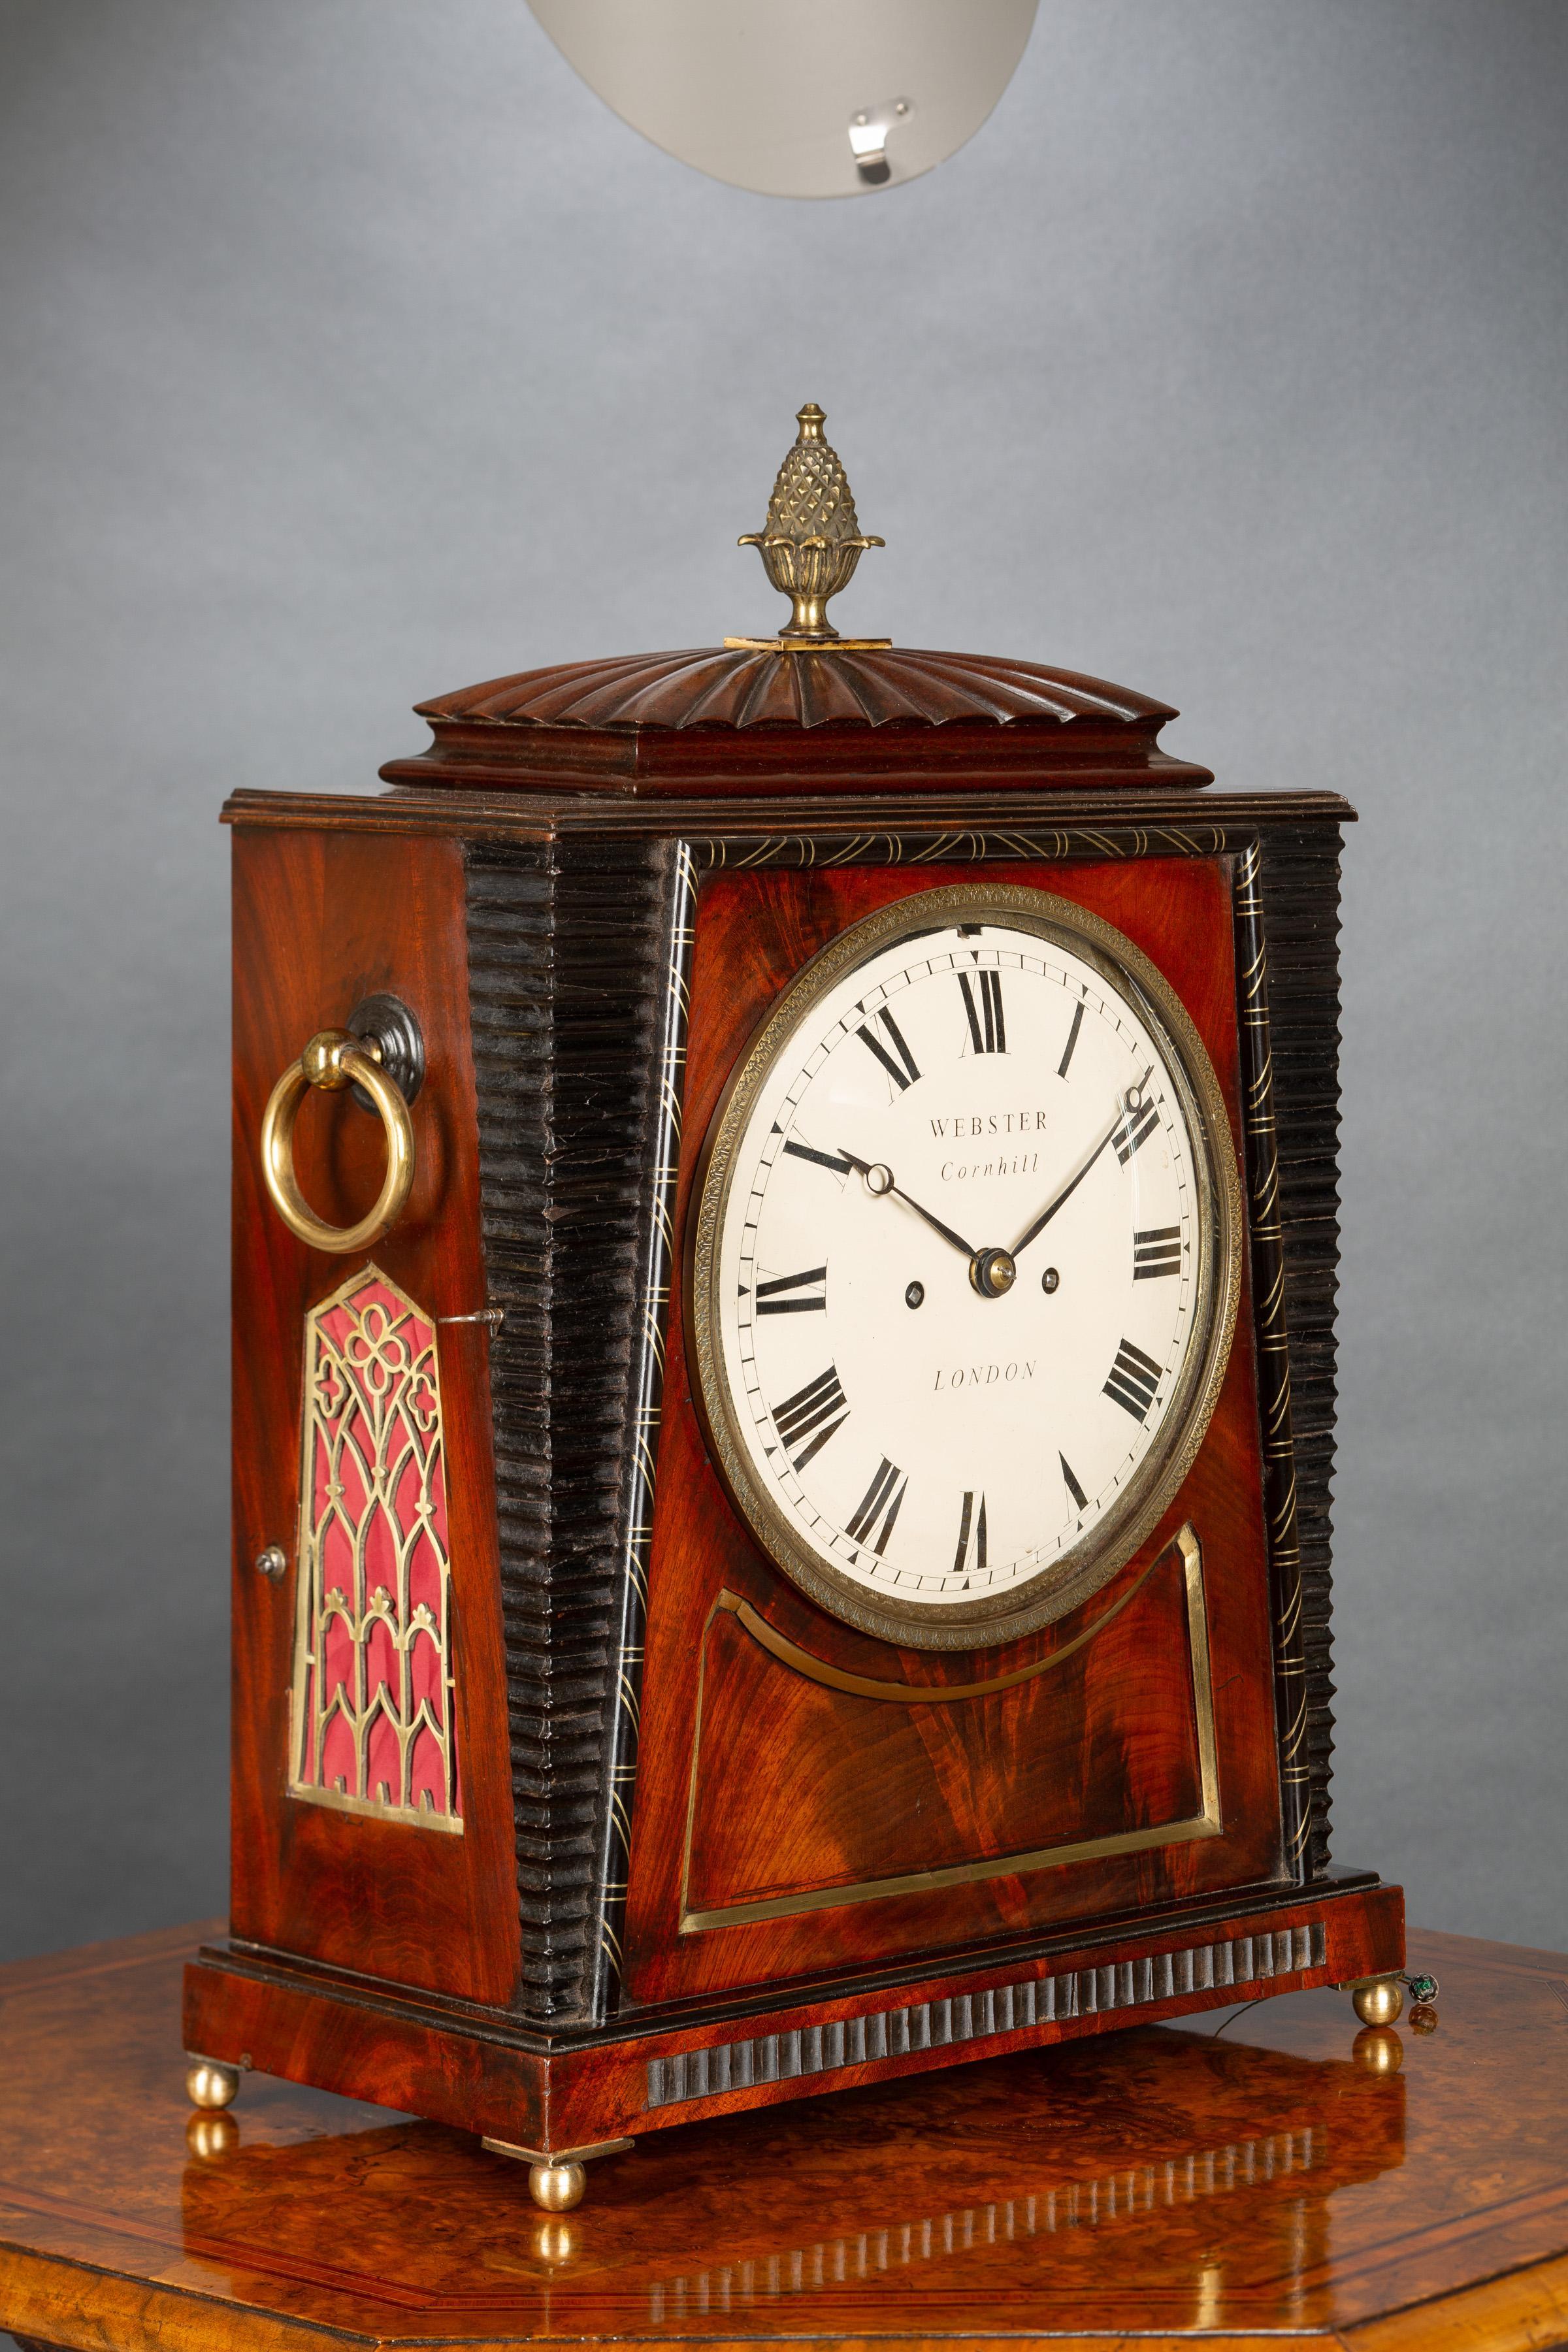 Regency Mahogany Bracket Clock by Richard Webster, Cornhill